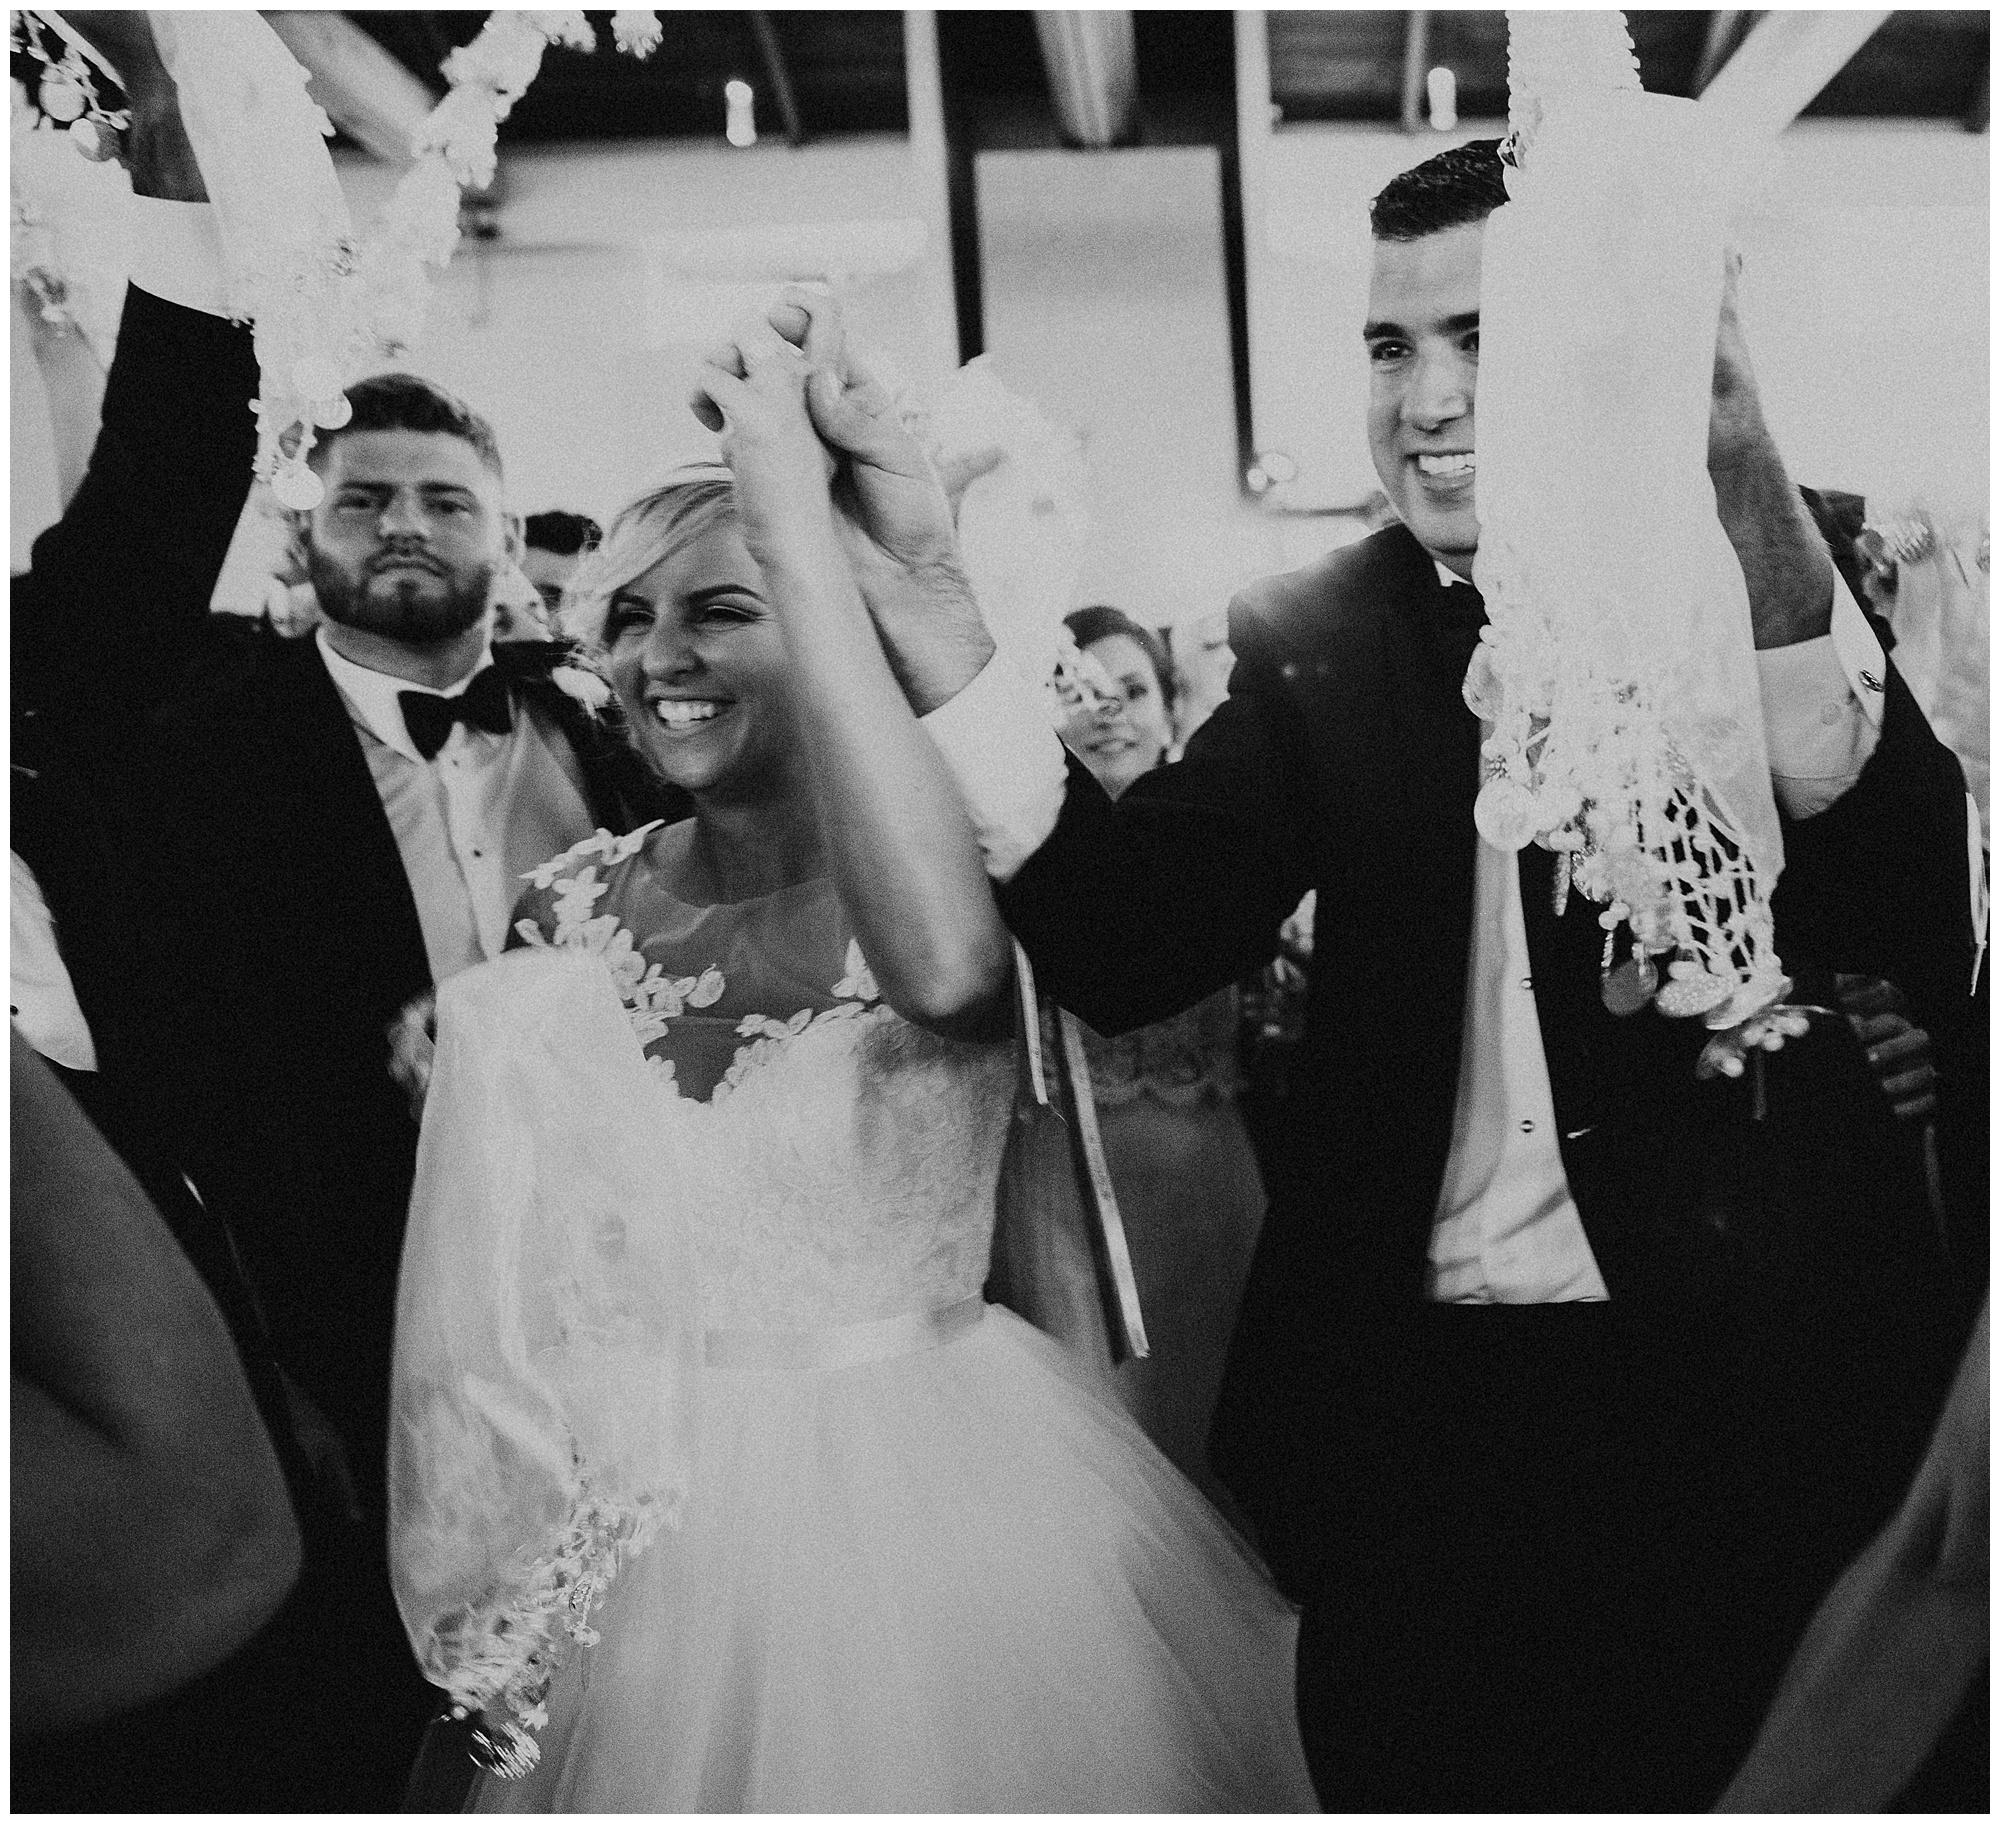 pear_tree_estate_wedding_champaign_il_wright_photographs_jj_0050.jpg